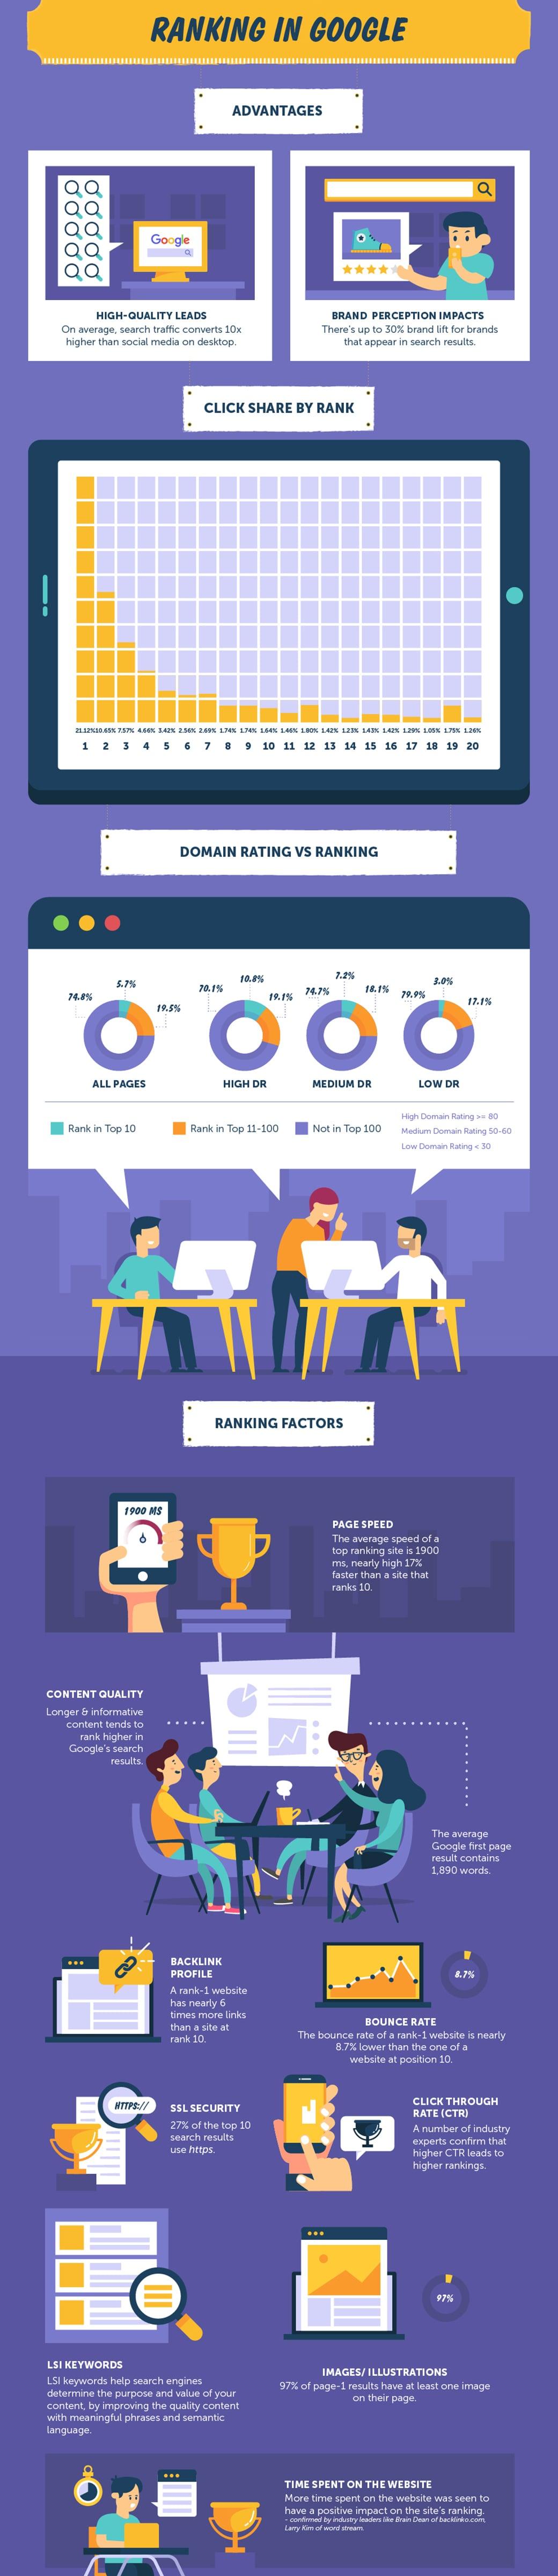 Google ranking local seo statistics